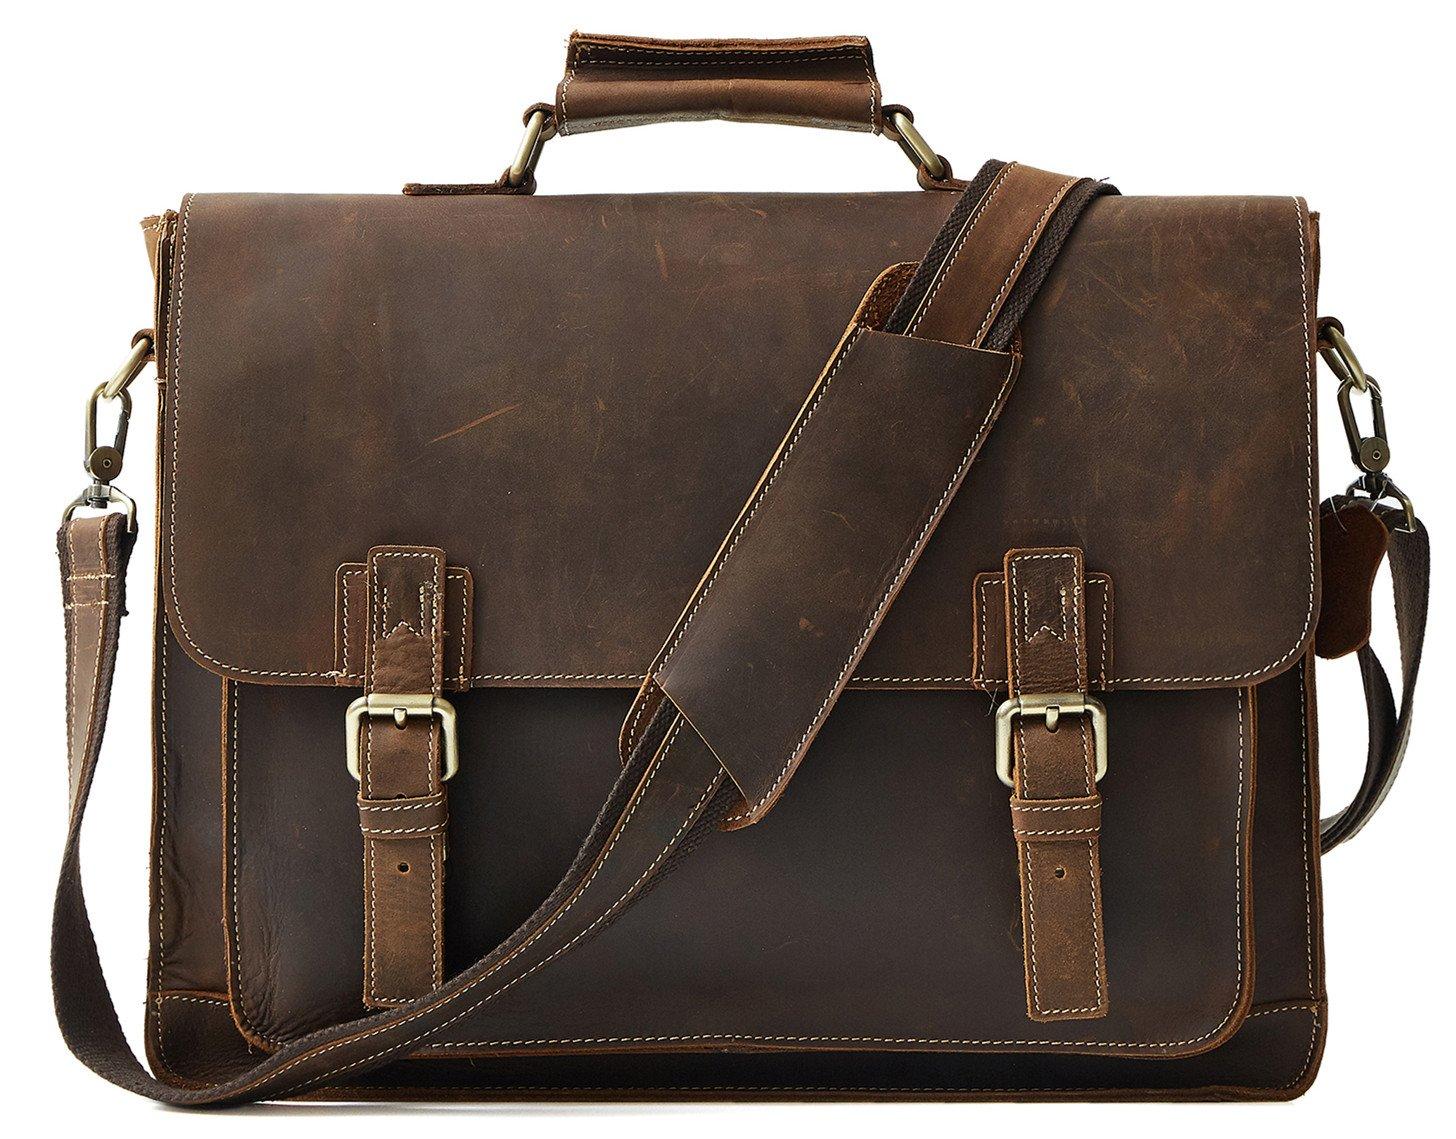 LXFF Mens Genuine Leather Briefcase Messenger Bag 16'' Laptop Tote Bag Vintage Brown